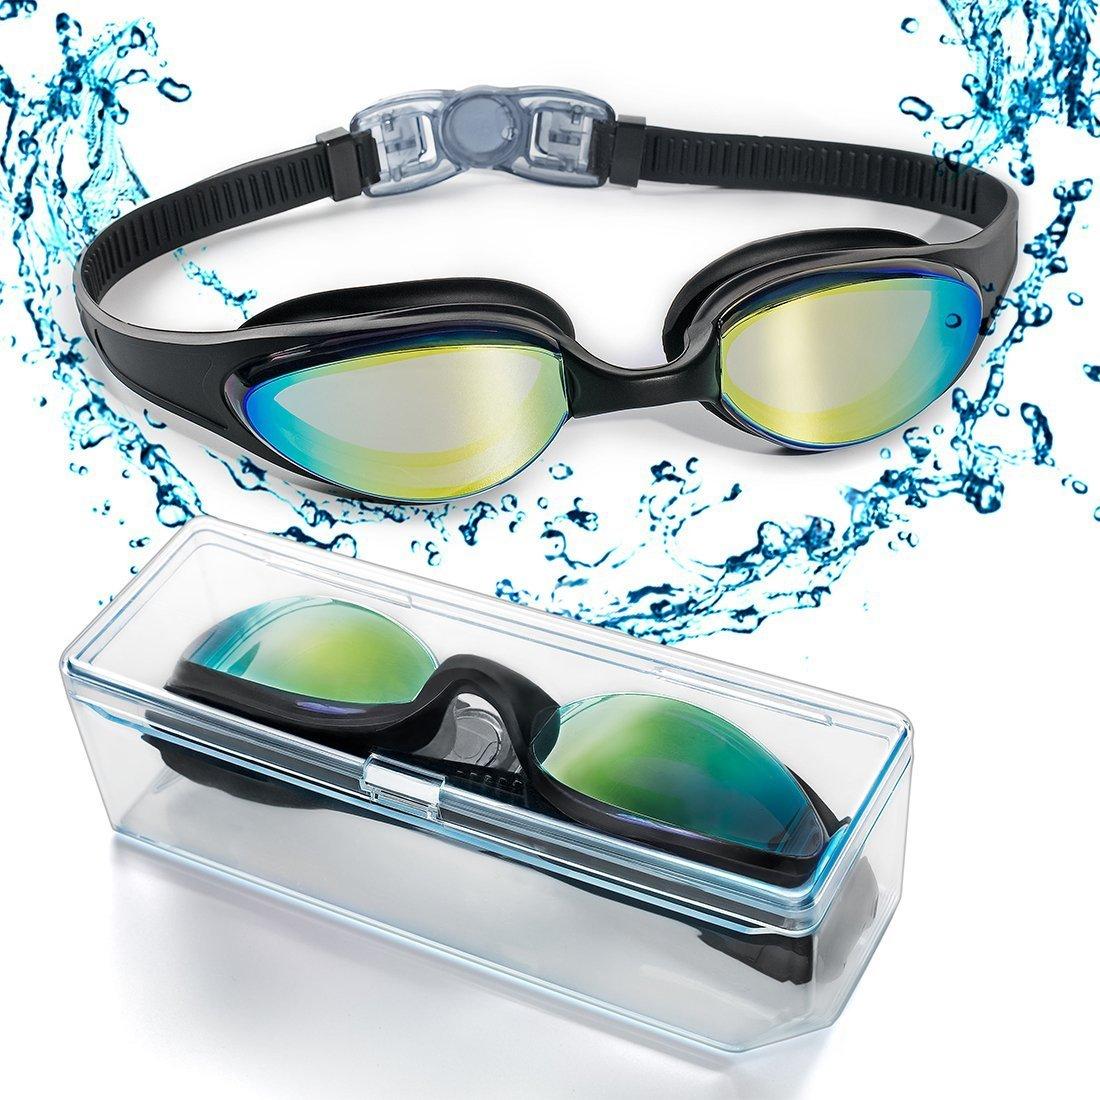 HYX Swim Goggles, Swimming Goggles with Flexible Soft Nose Bridge & Coloured Mirror Lenses, No Leaking Anti Fog Uv Protection Triathlon Swim Goggles for Adult Men Women Youth Kids Ltd HYX-1-L